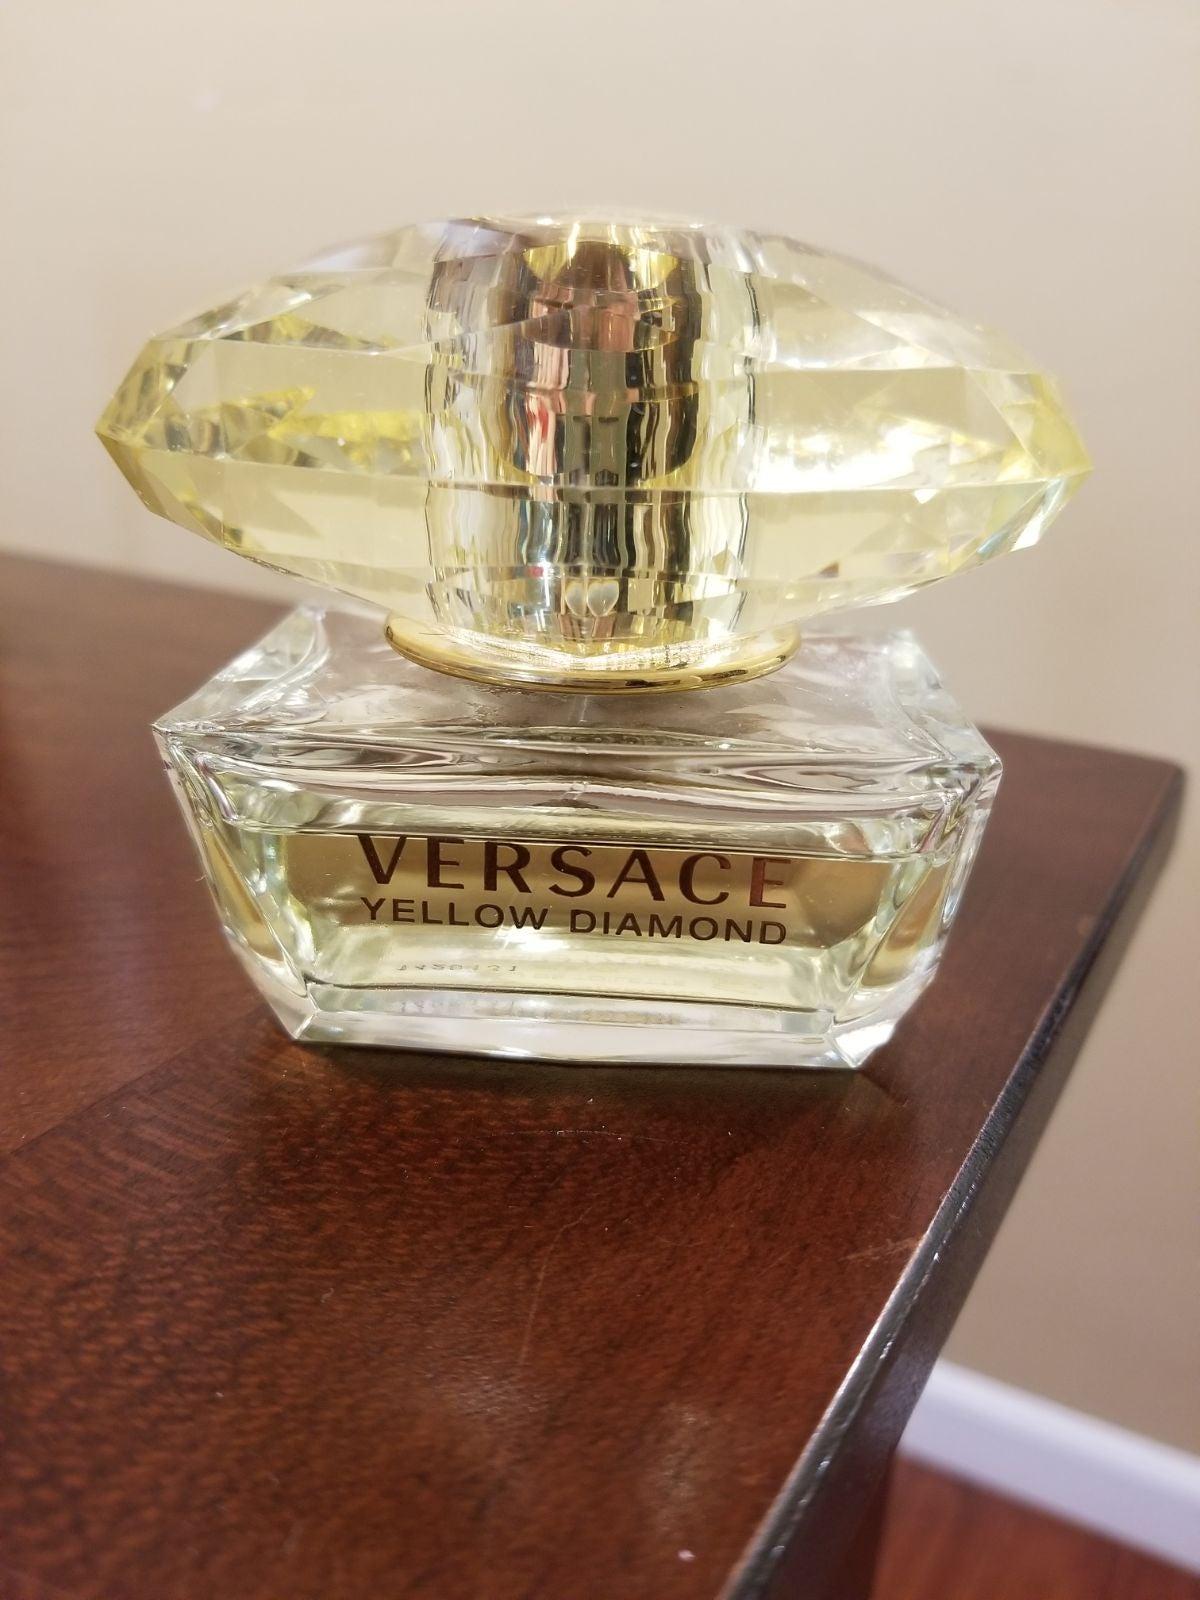 Versace Yellow Diamond Perfume 1.7 fl oz